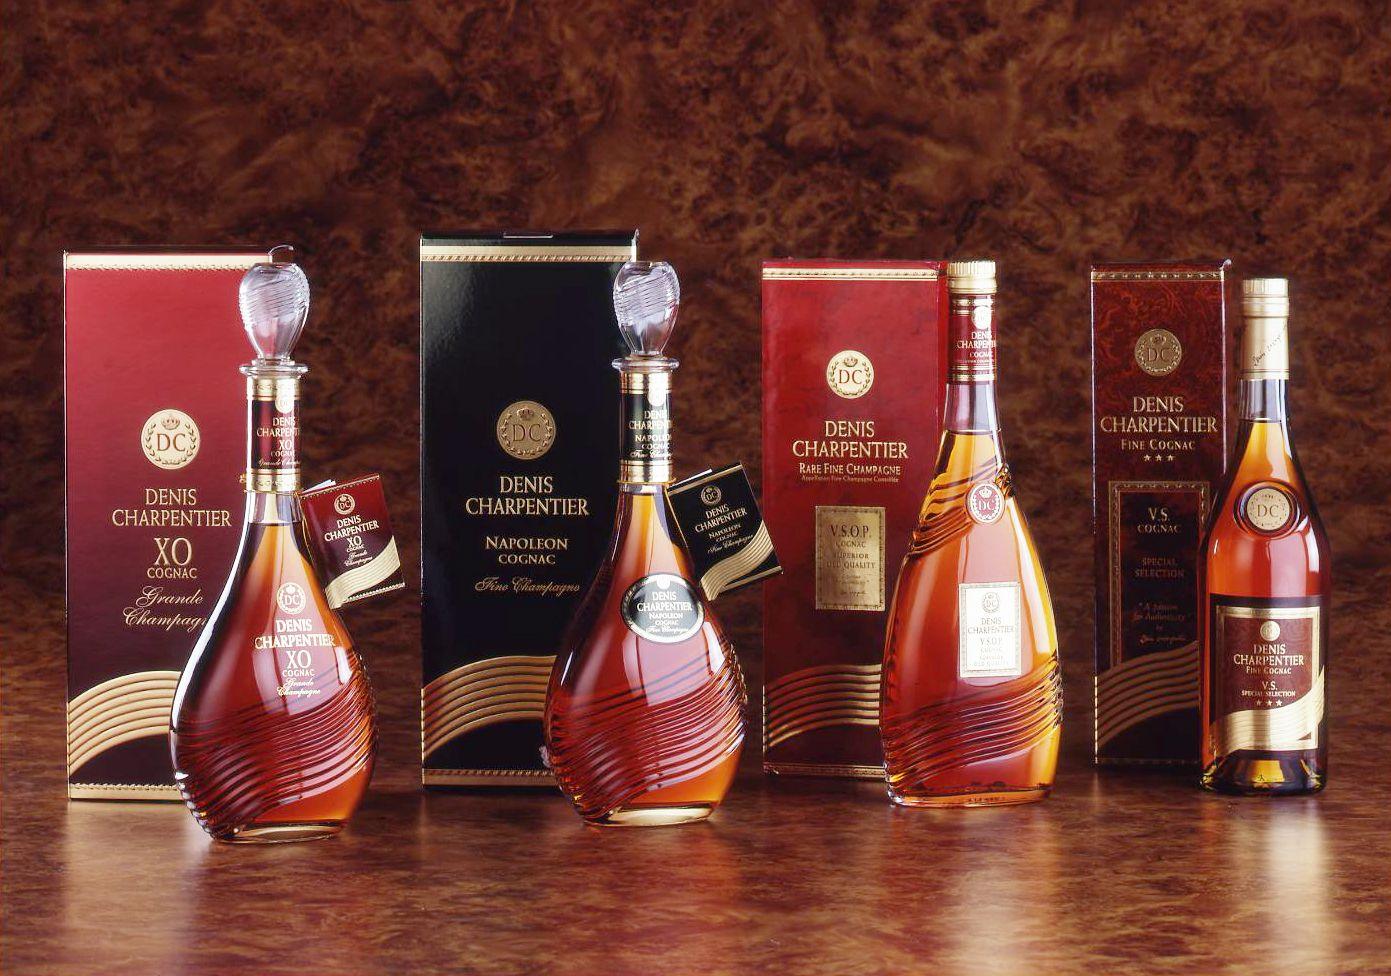 Denis Charentier Gamme Cognac Memento Linea Wine Bottle Liquor Bottles Bottle Packaging